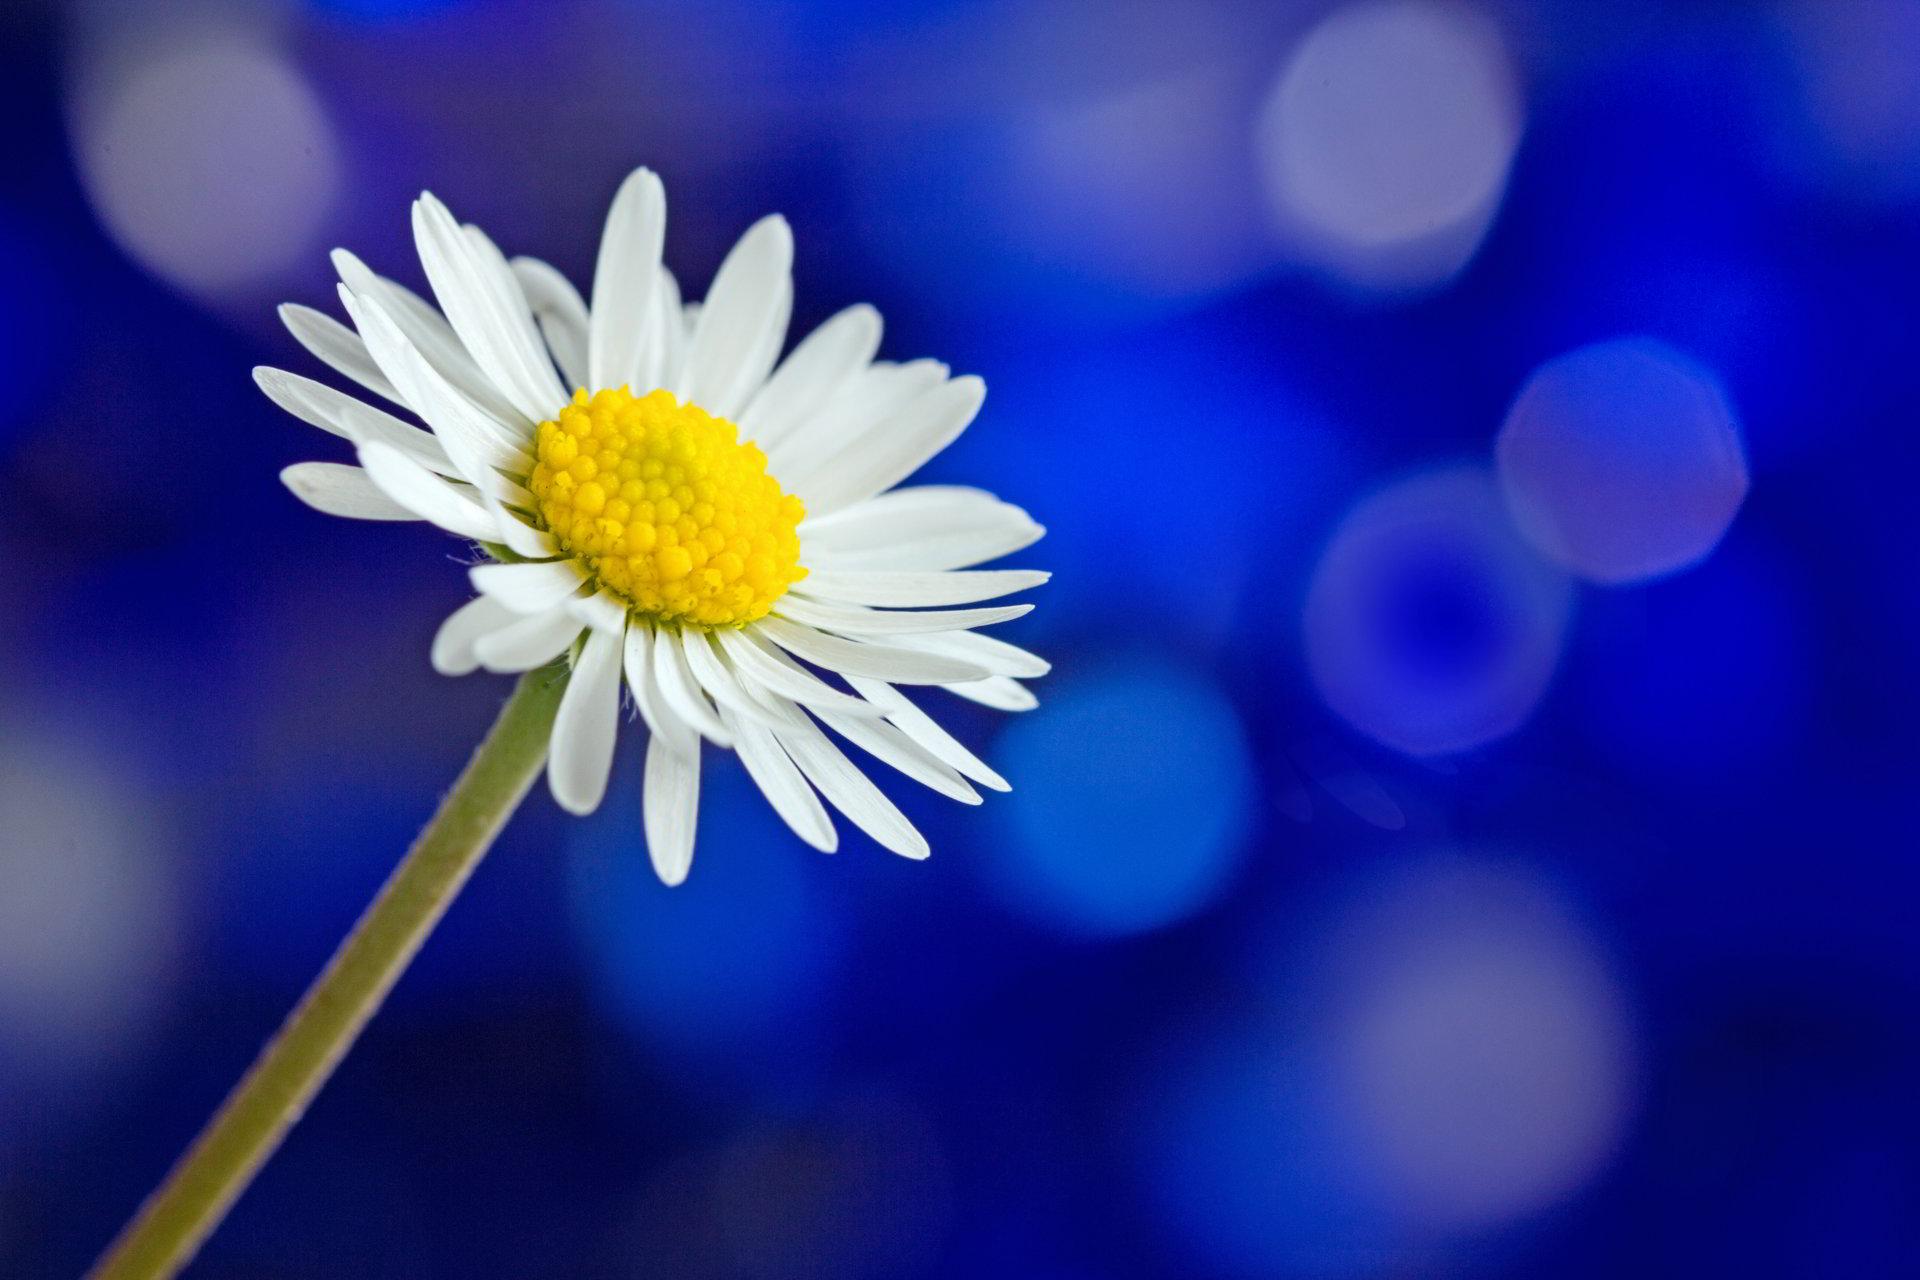 hinh anh hoa cuc dep 43